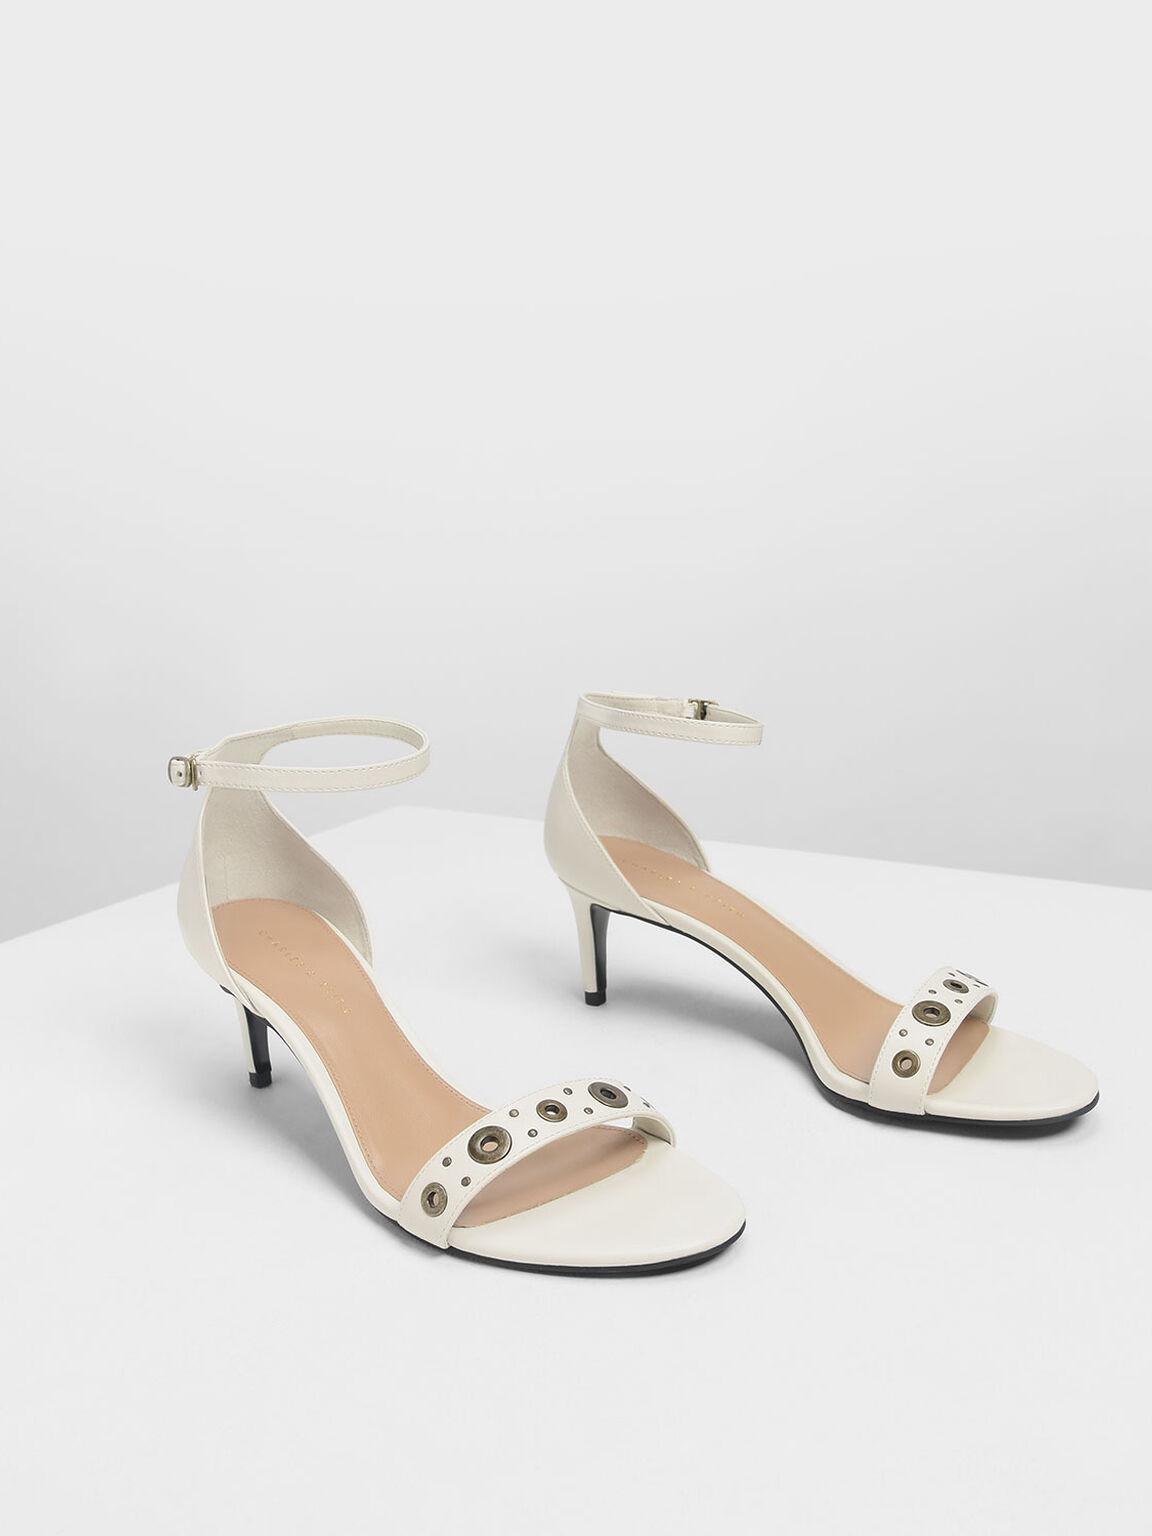 Grommet Detail Heeled Sandals, Cream, hi-res